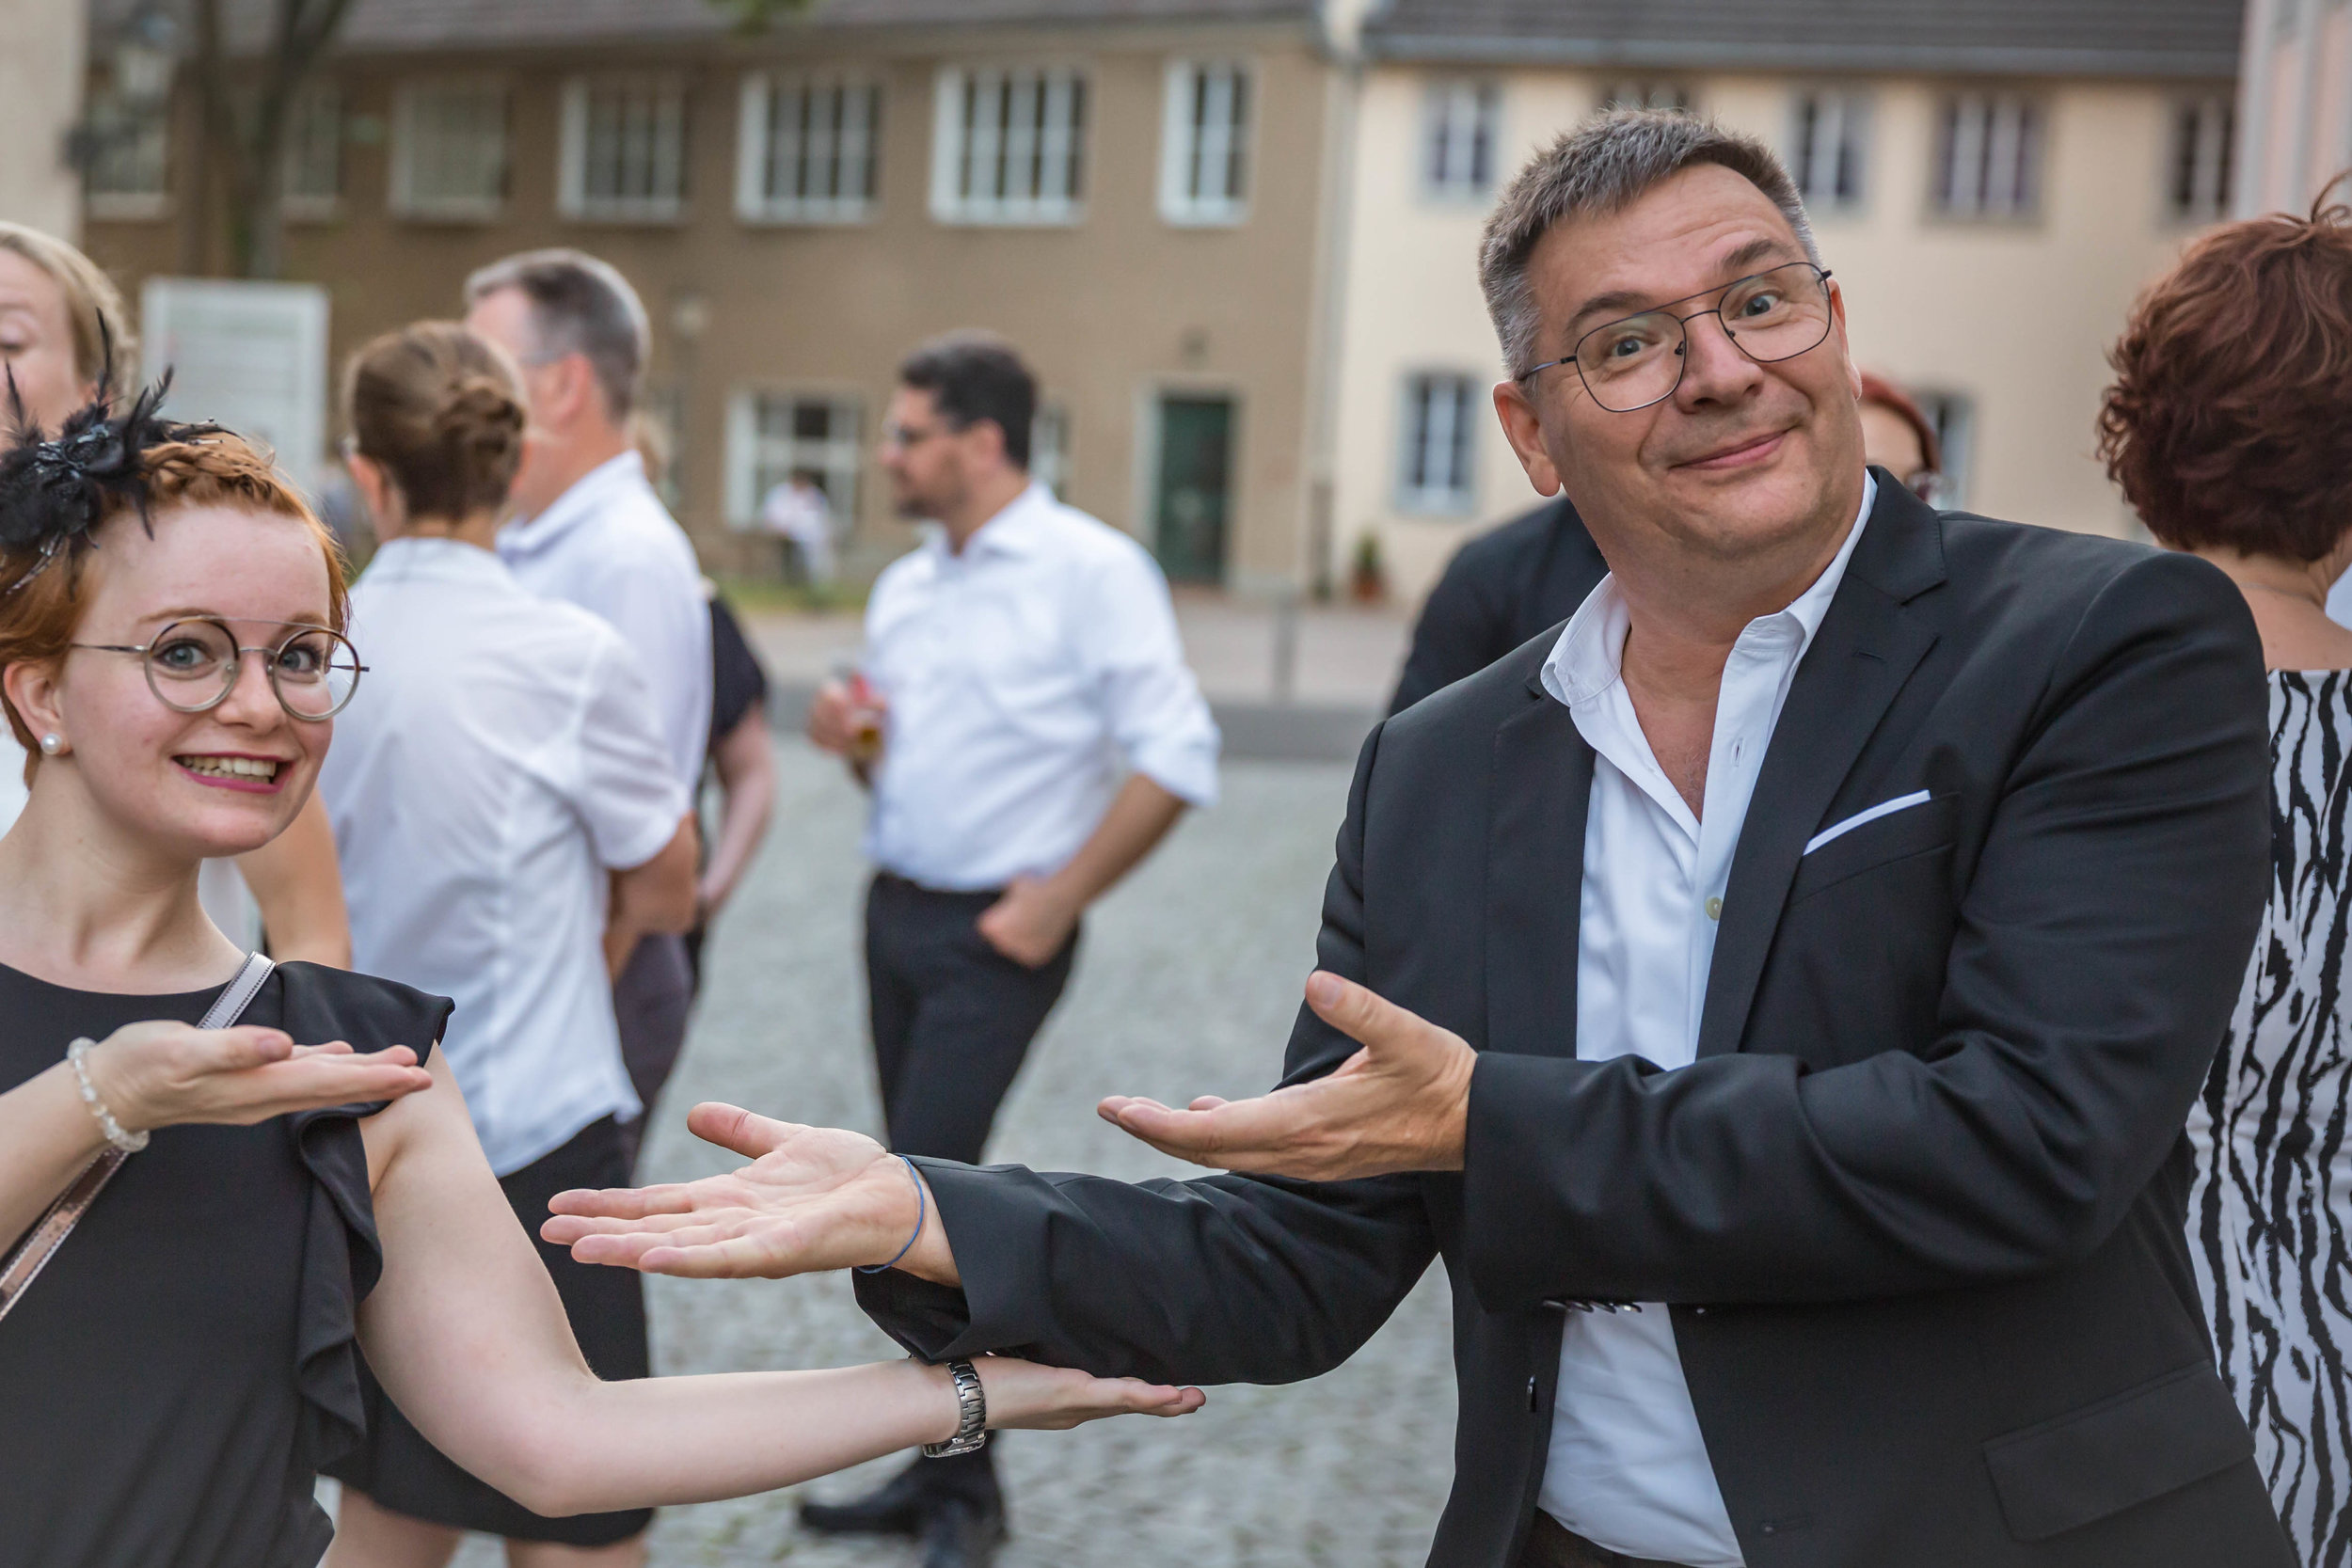 20190626_Akademie_40-jähriges_Jubiläum_FB_kl-5312051.jpg